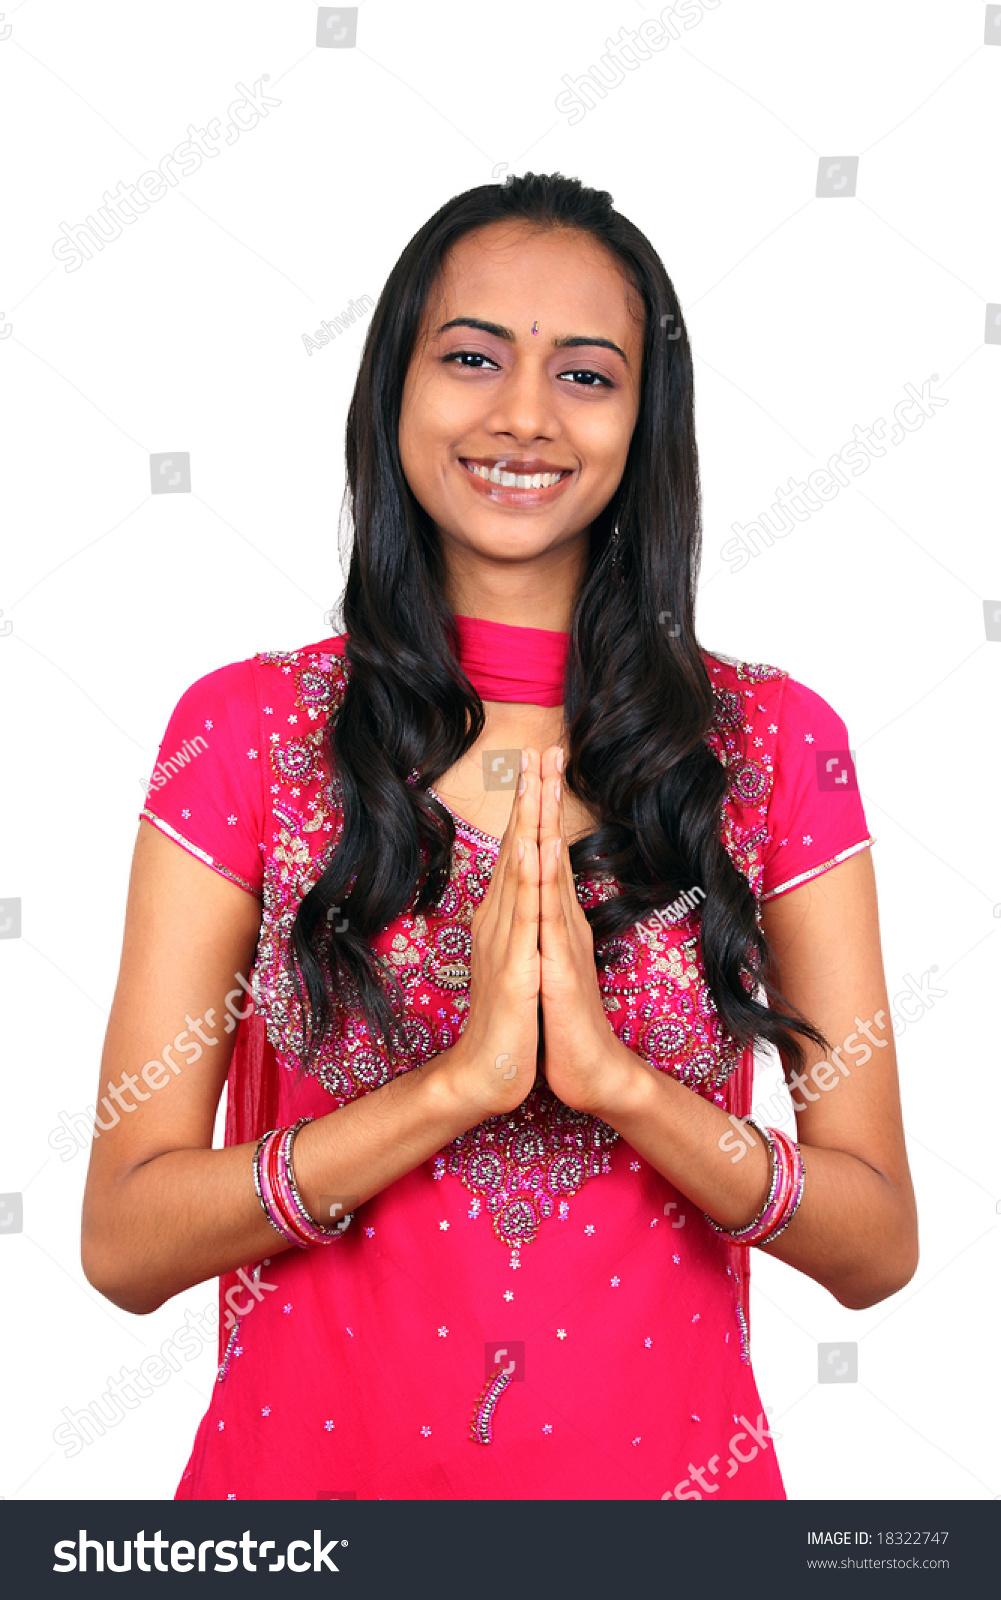 Beautiful Young Indian Girl Namaste Pose Stock Photo -5363